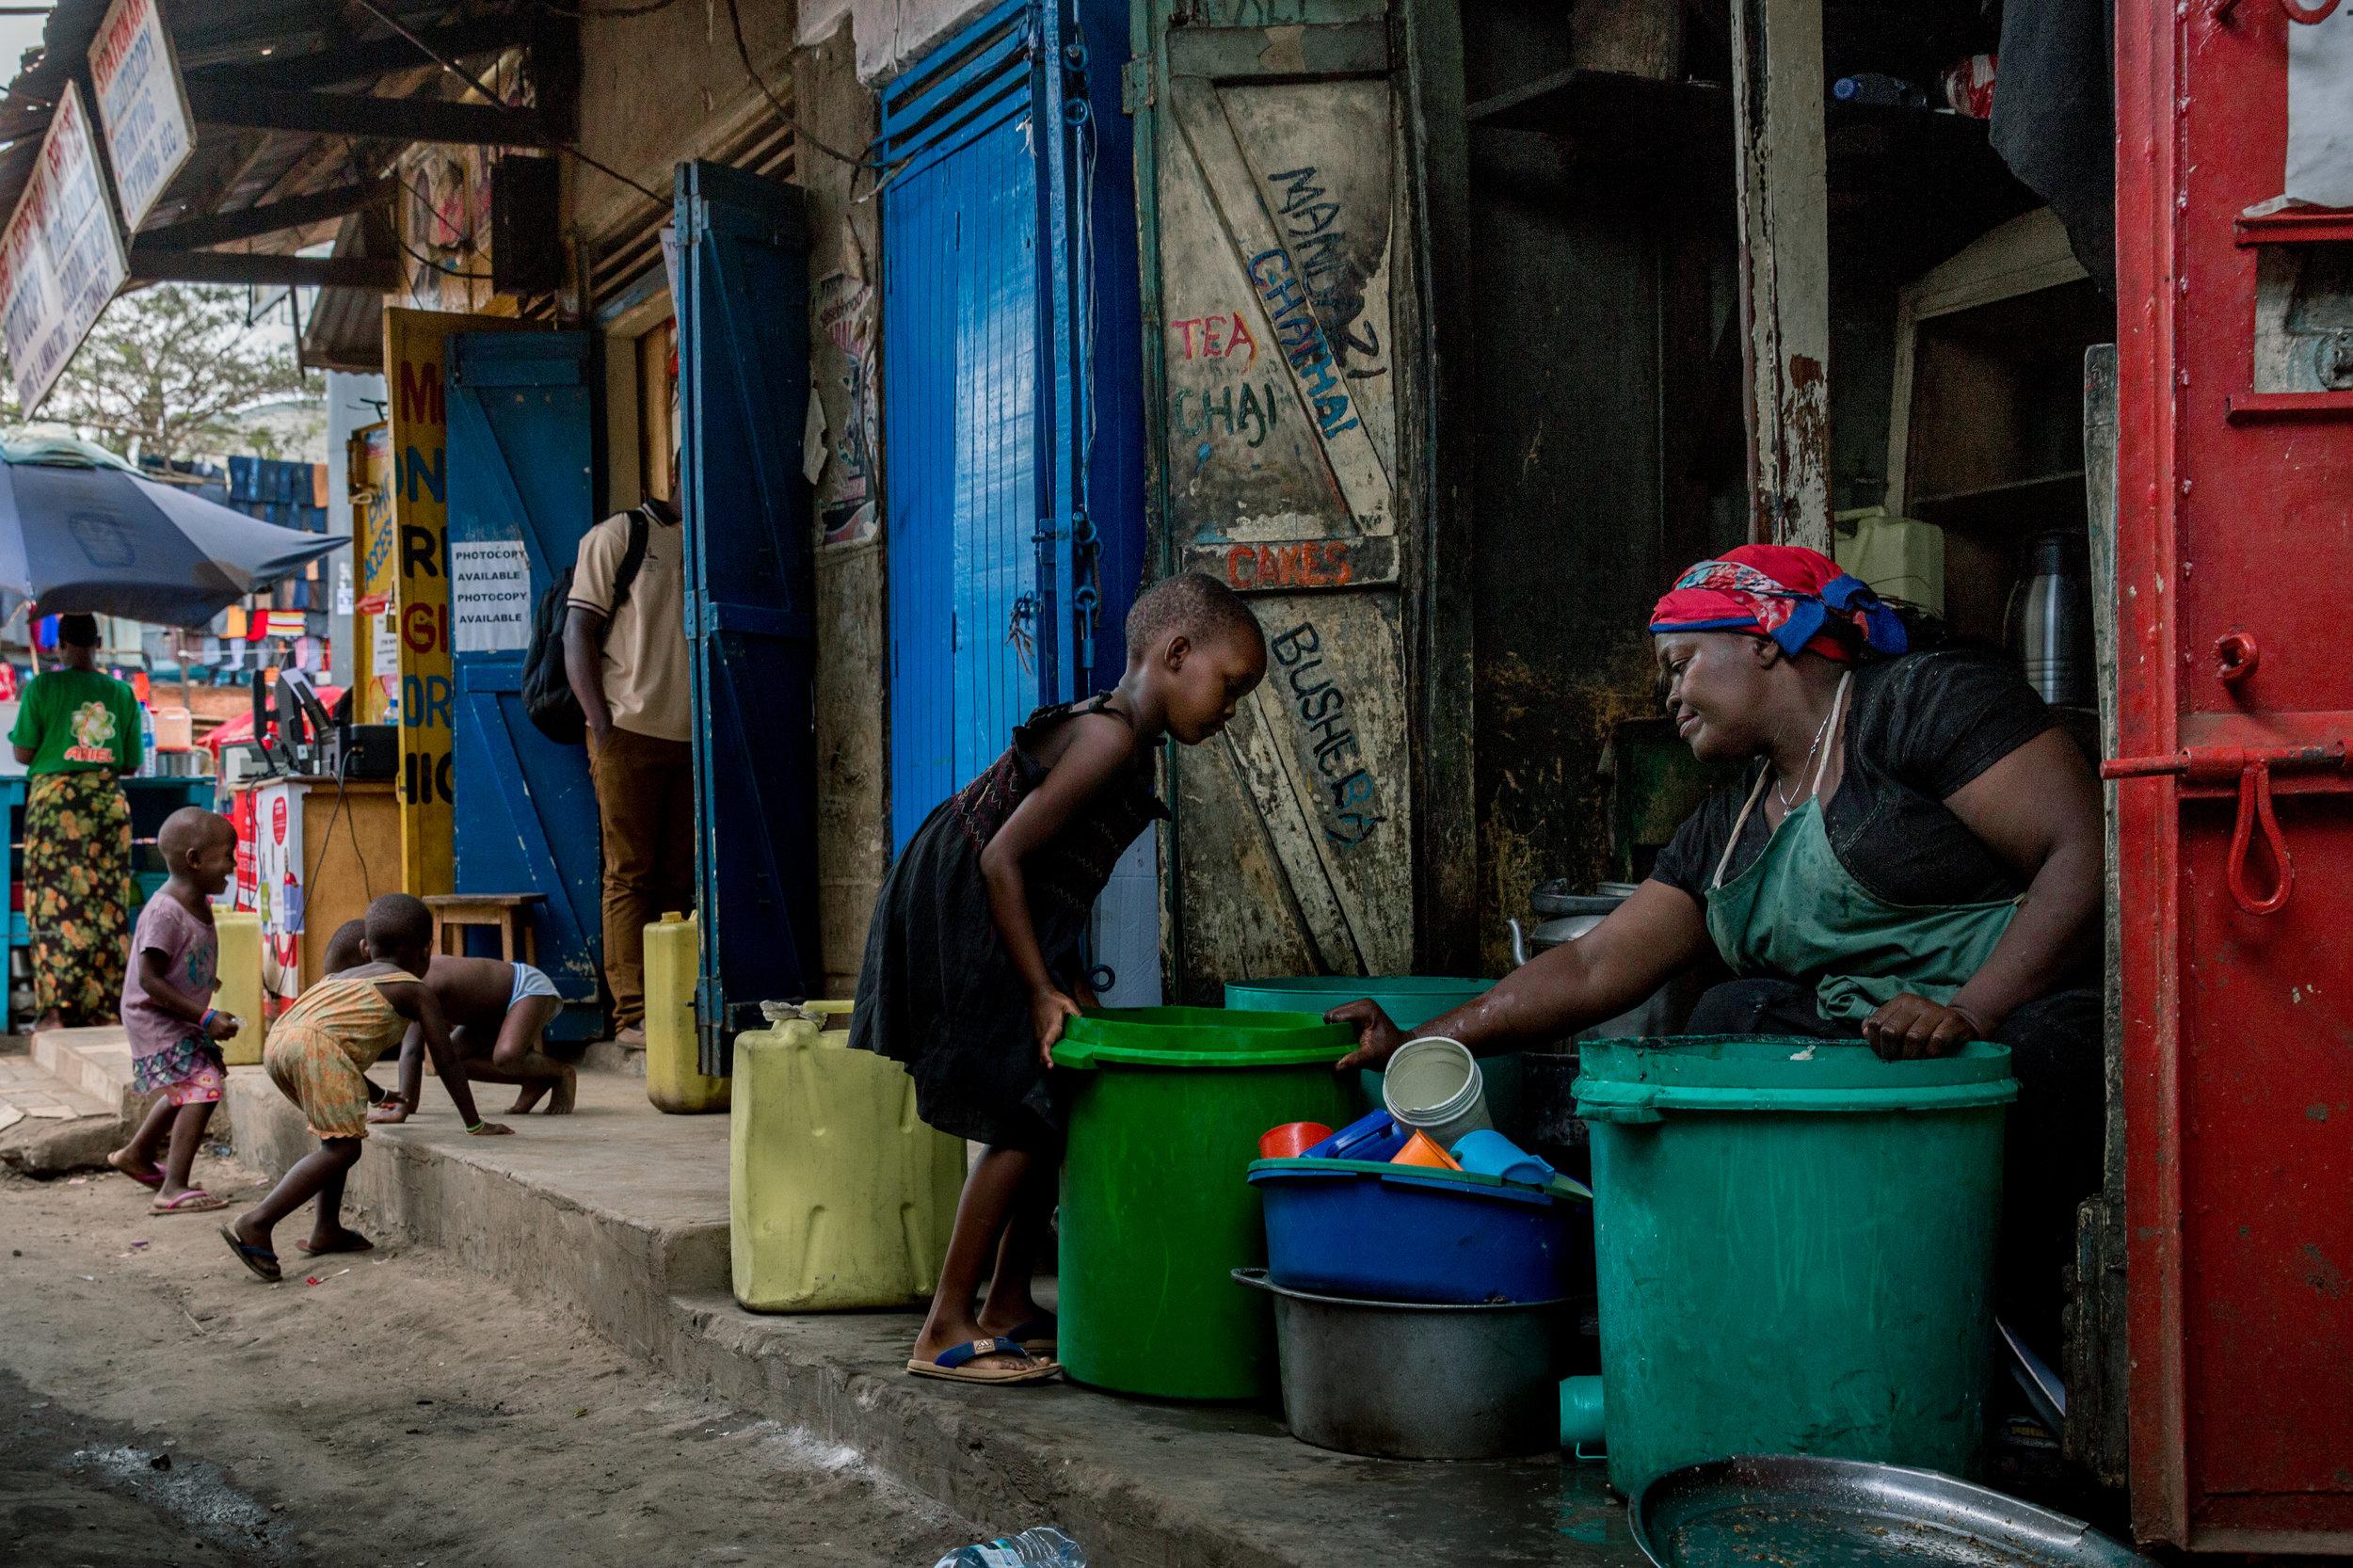 UgandaDay5StreetPhotos-7.jpg